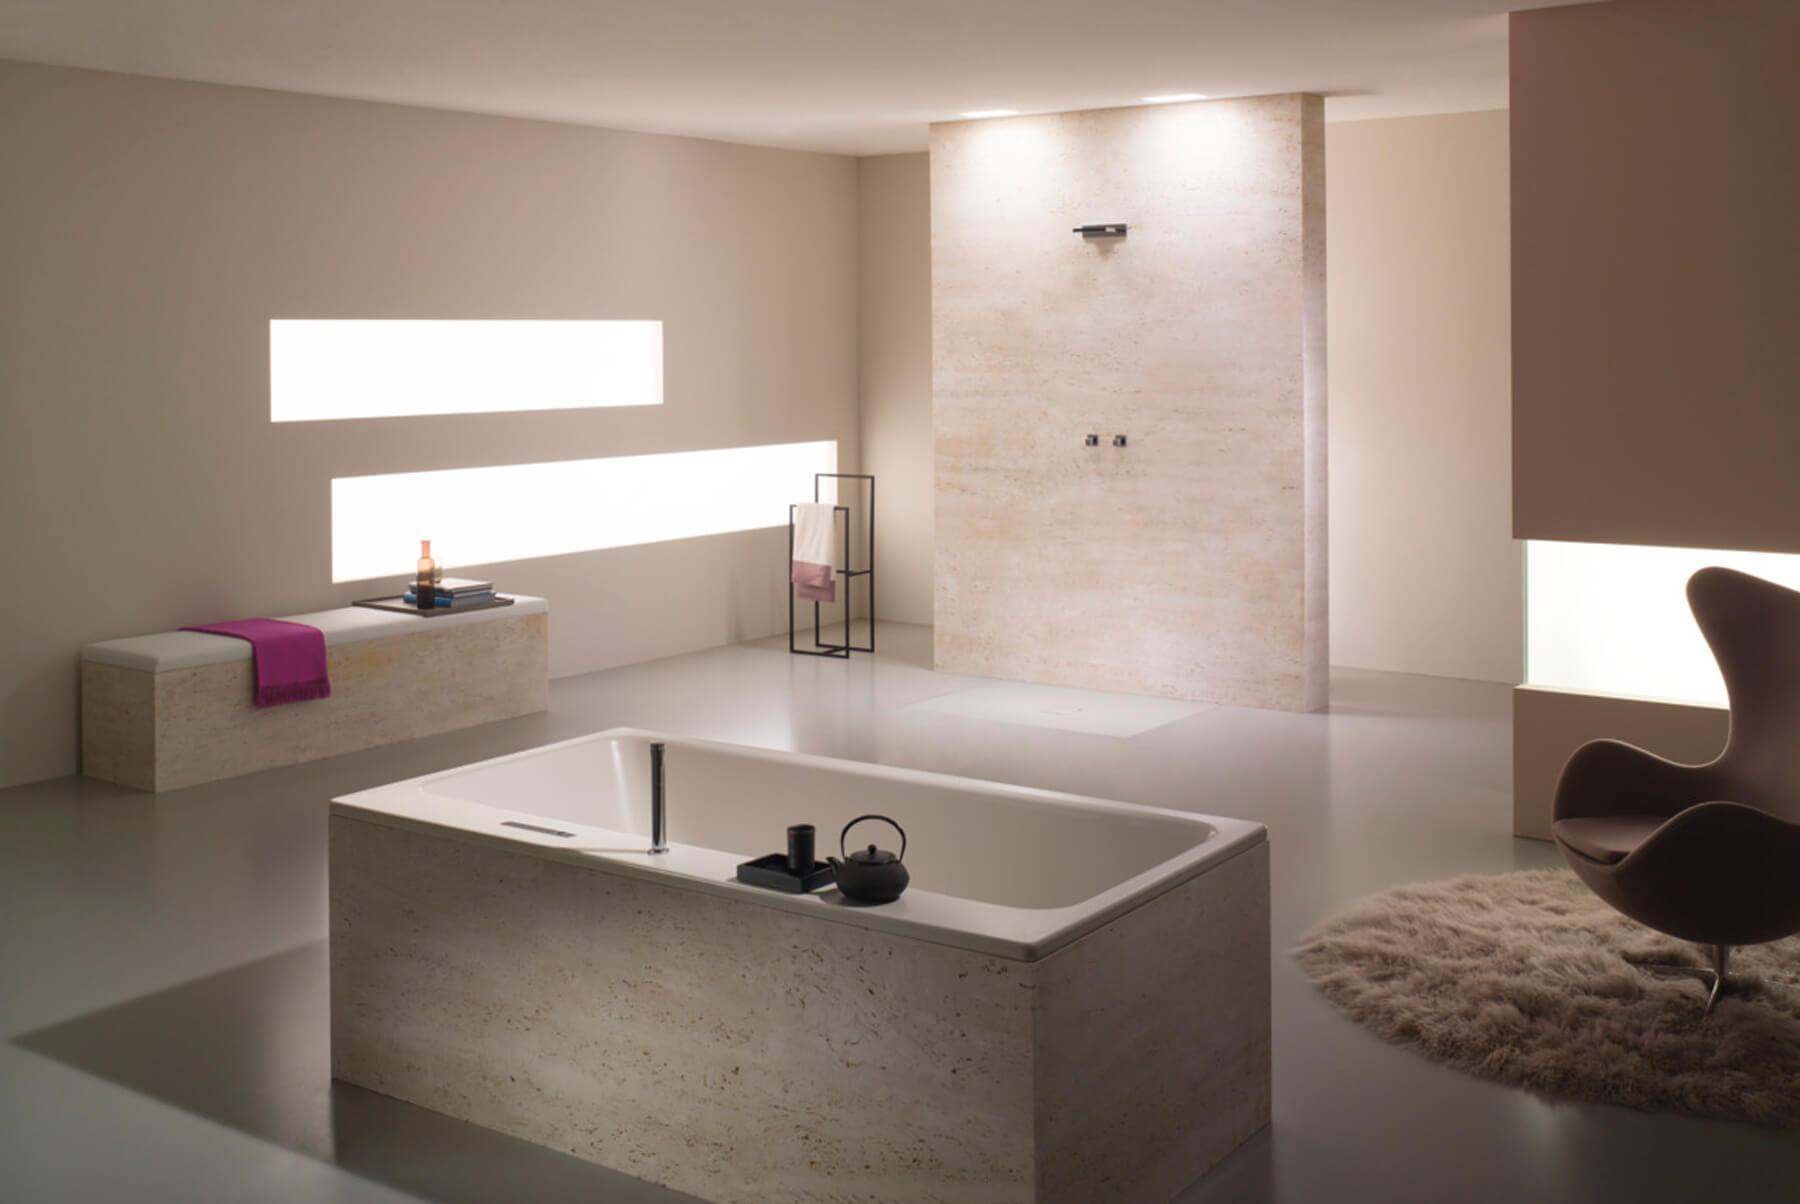 Bath-Tubs-Kaldewei-asymmetric-2-1800x1204